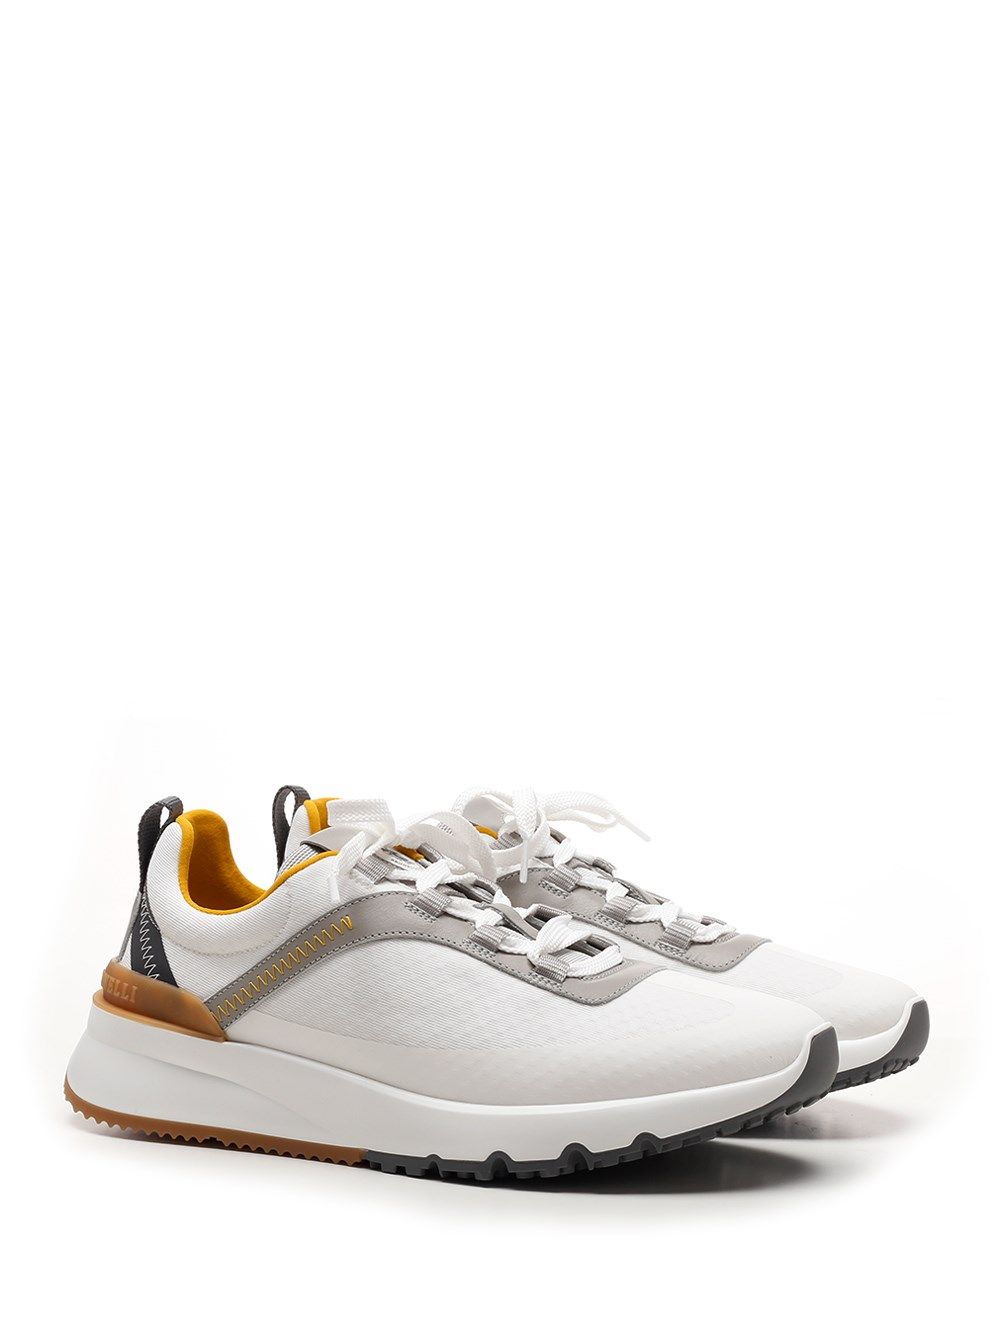 BRUNELLO CUCINELLI Activewears BRUNELLO CUCINELLI MEN'S WHITE OTHER MATERIALS SNEAKERS